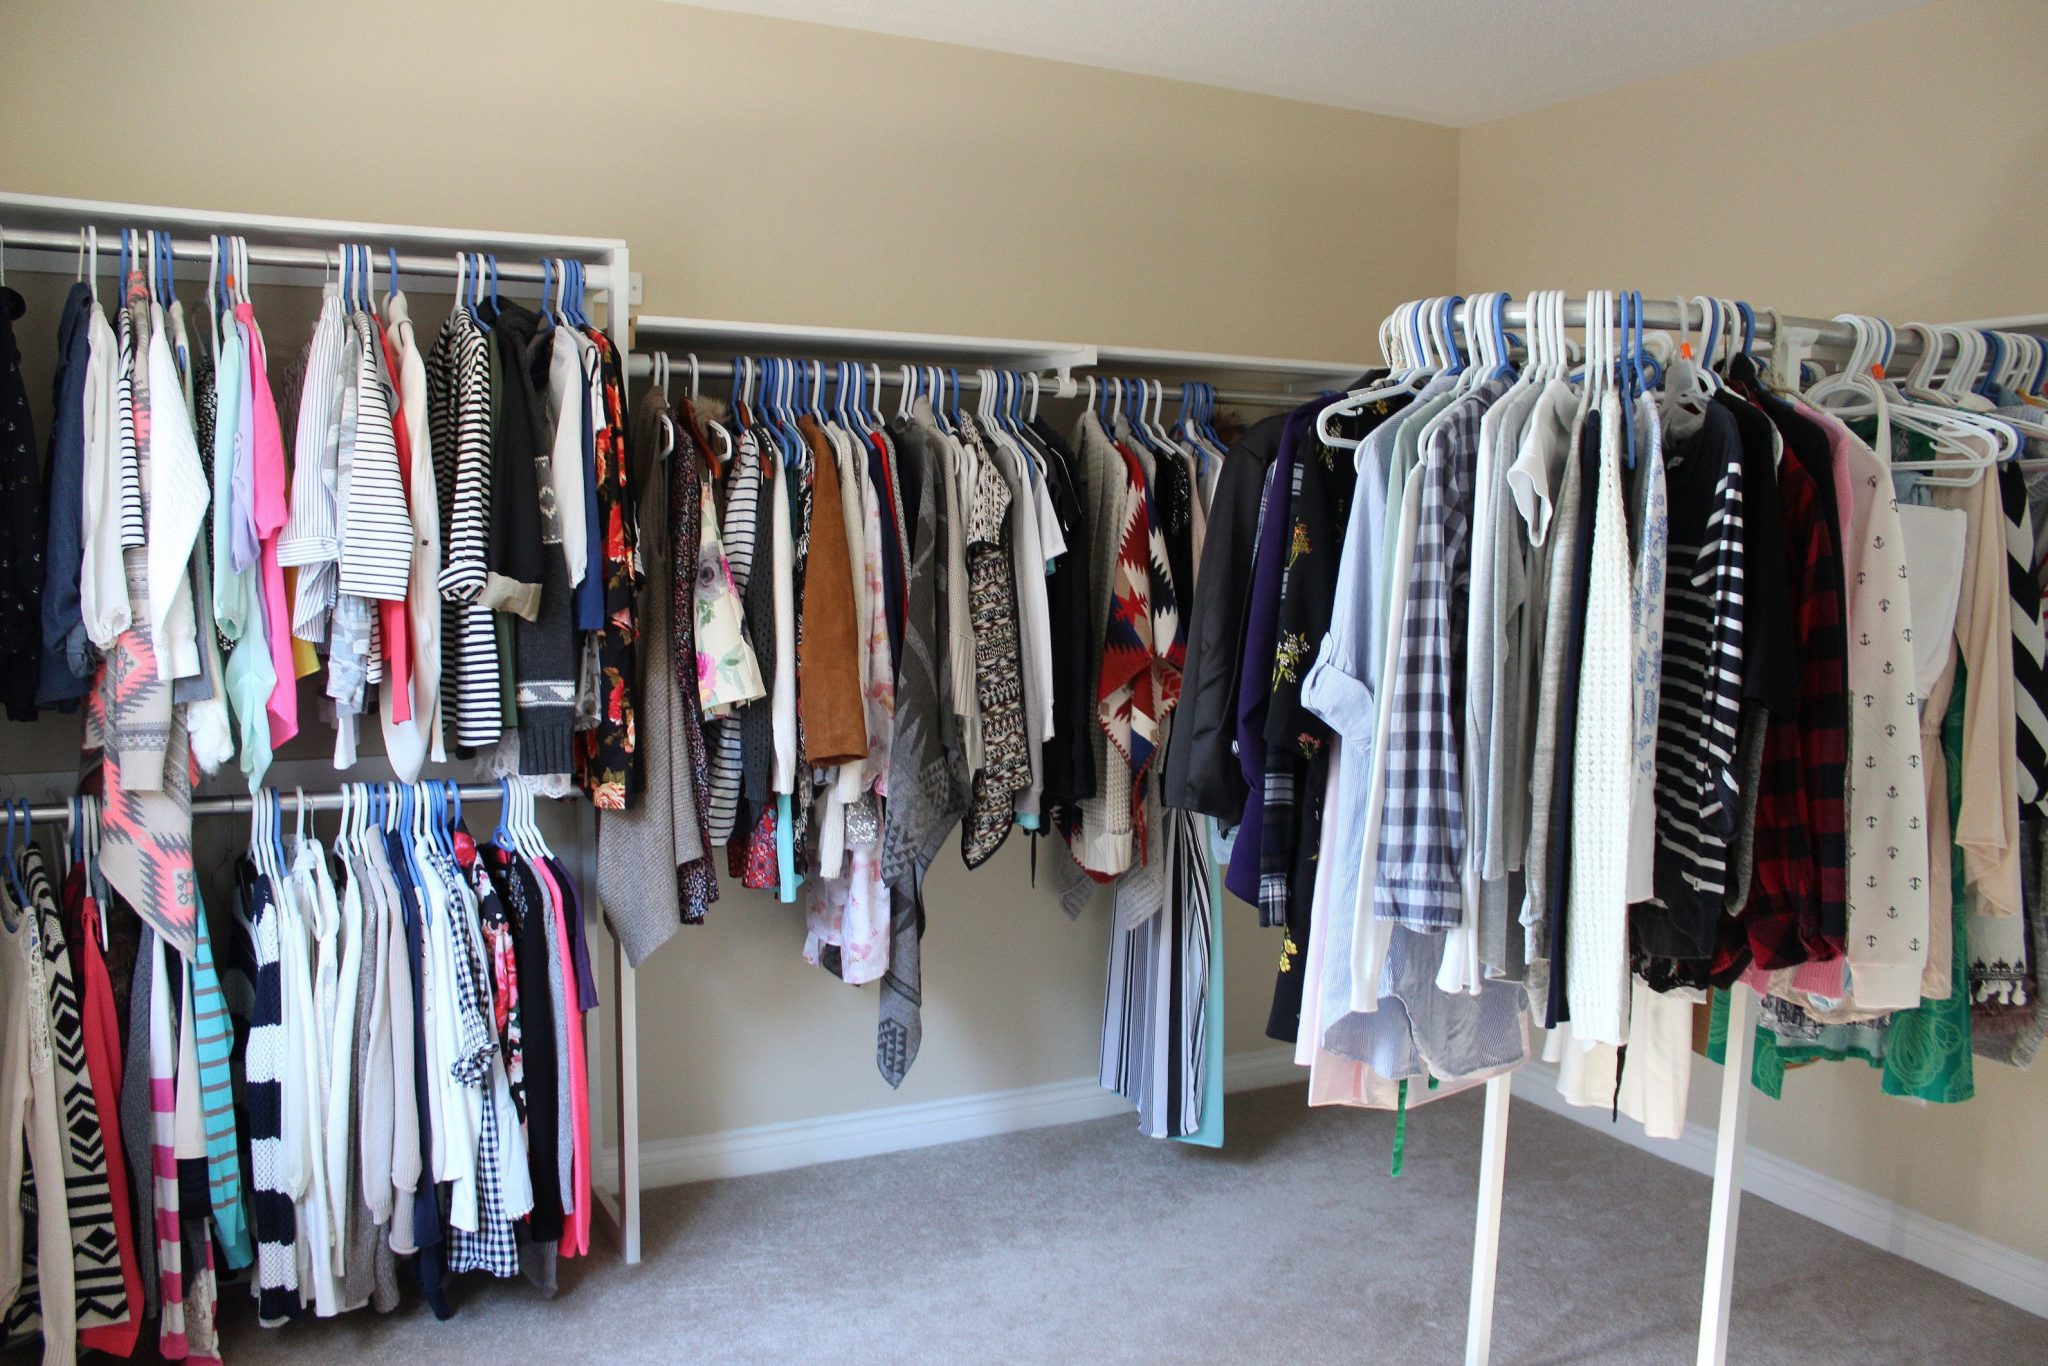 Closet-Renovation-Progress-Update